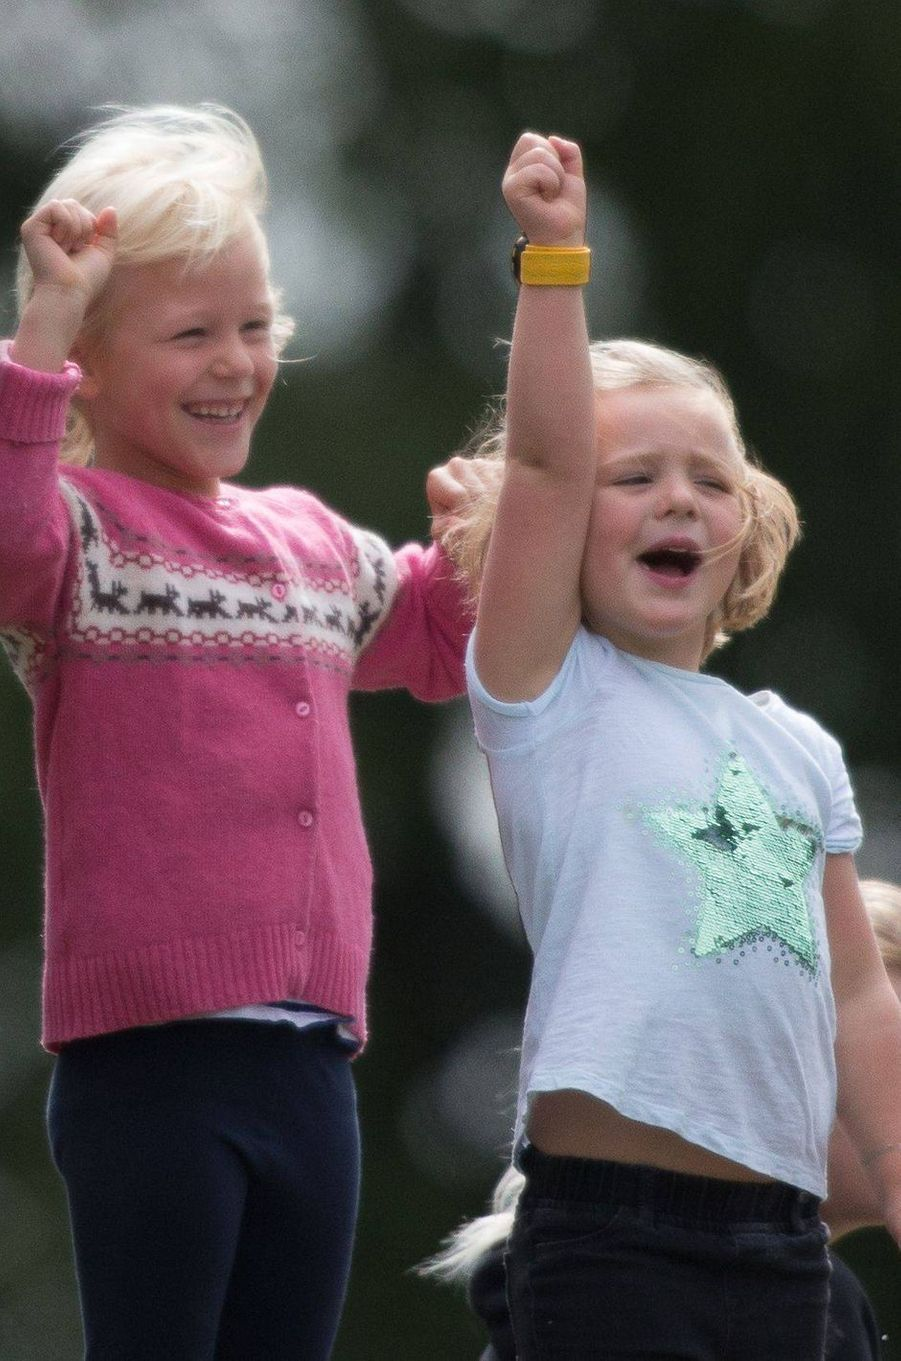 Mia Tindall avec sa cousine Isla Phillips à Gatcombe Park, le 9 septembre 2018